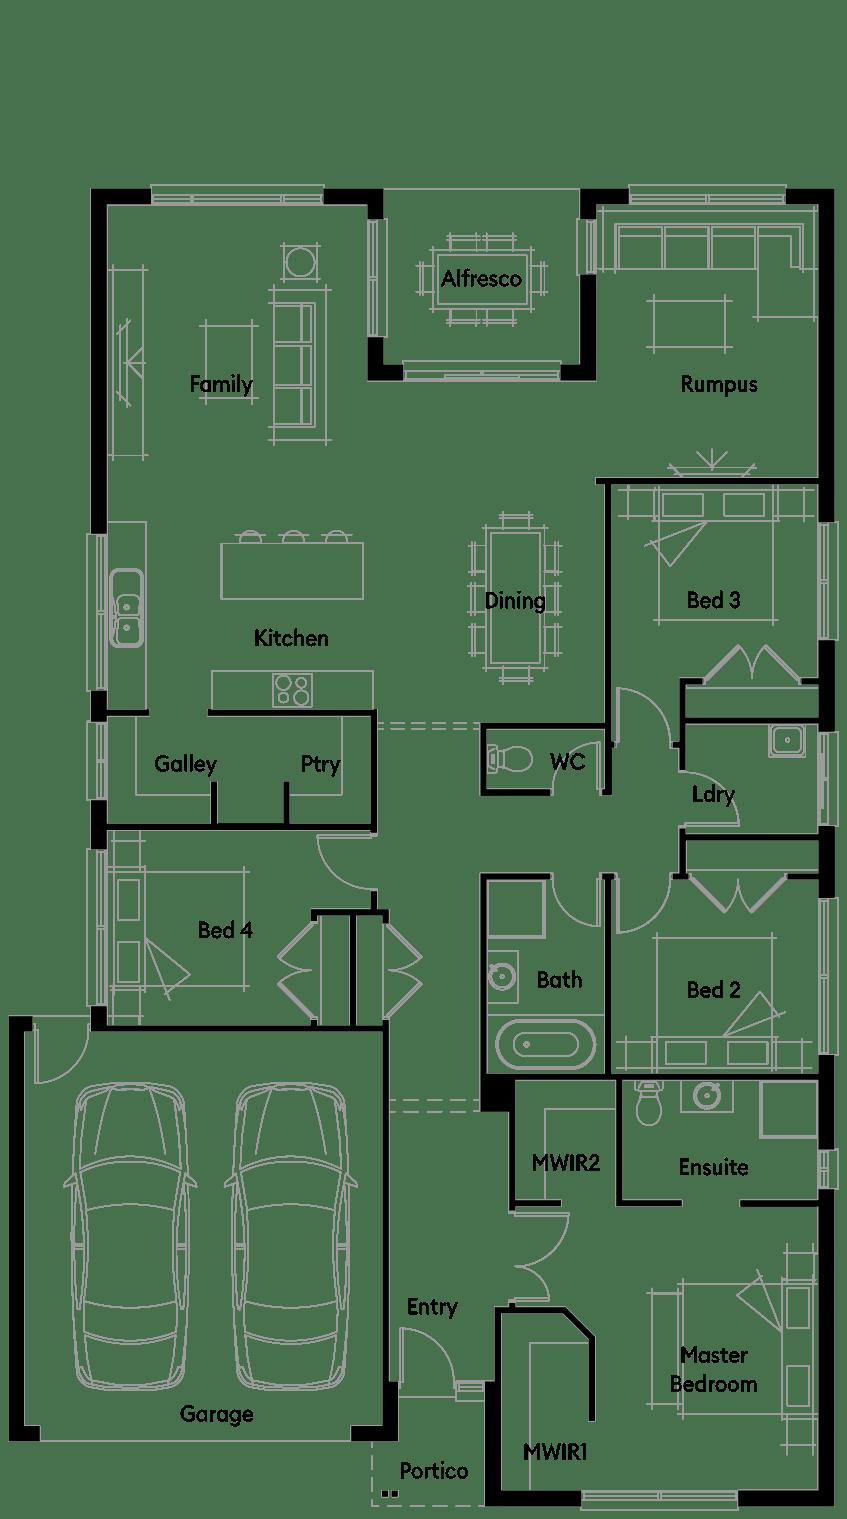 FloorPlan1_HOUSE761_Liverpool_25-4